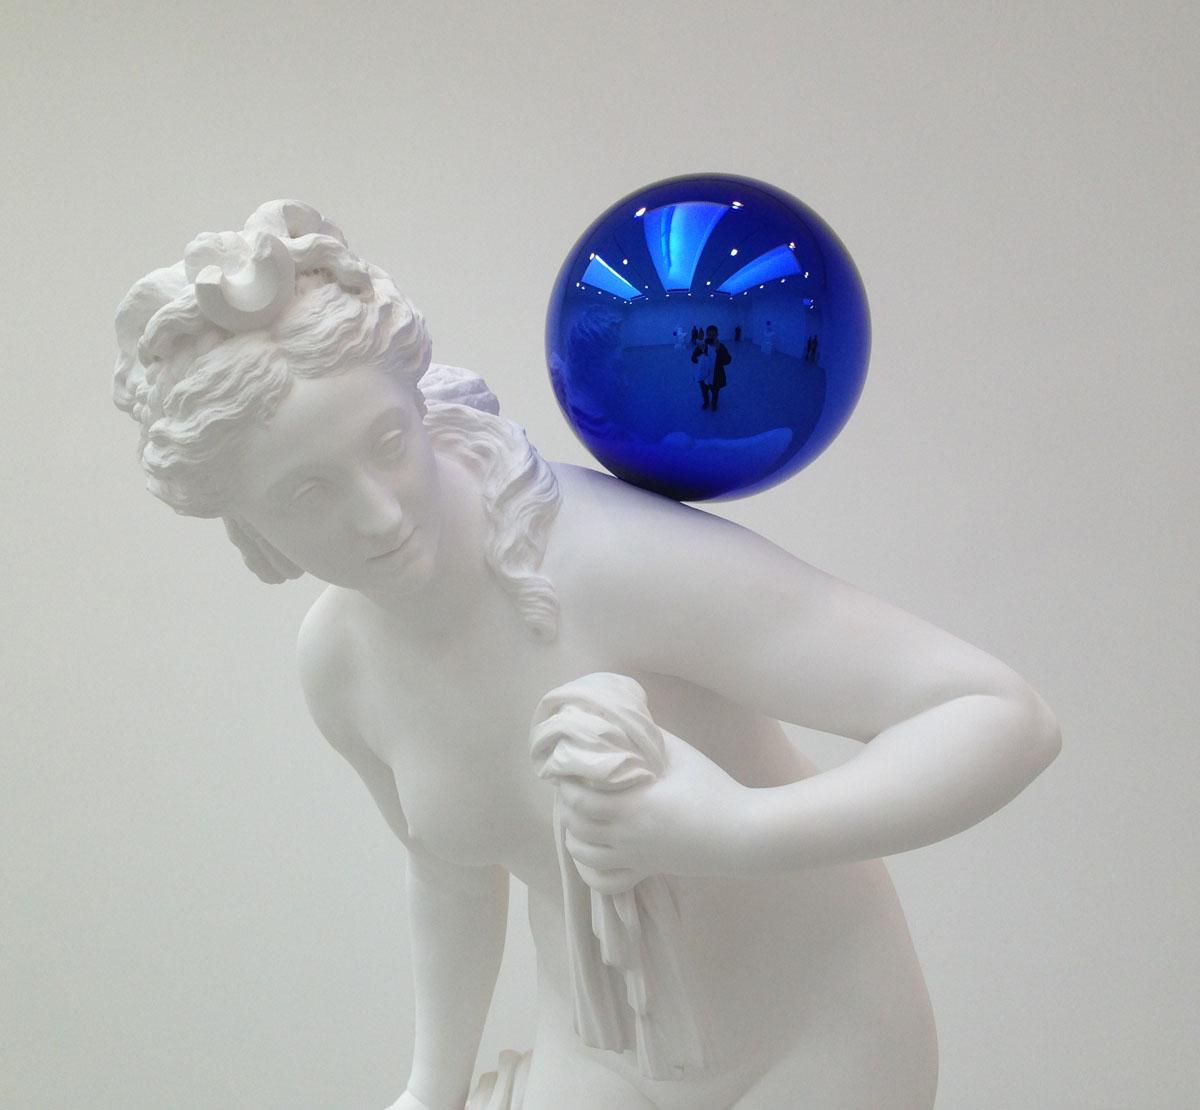 ART BLOG ART BLOG: JEFF KOONS: GAZING BALL @ DAVID ZWIRNER